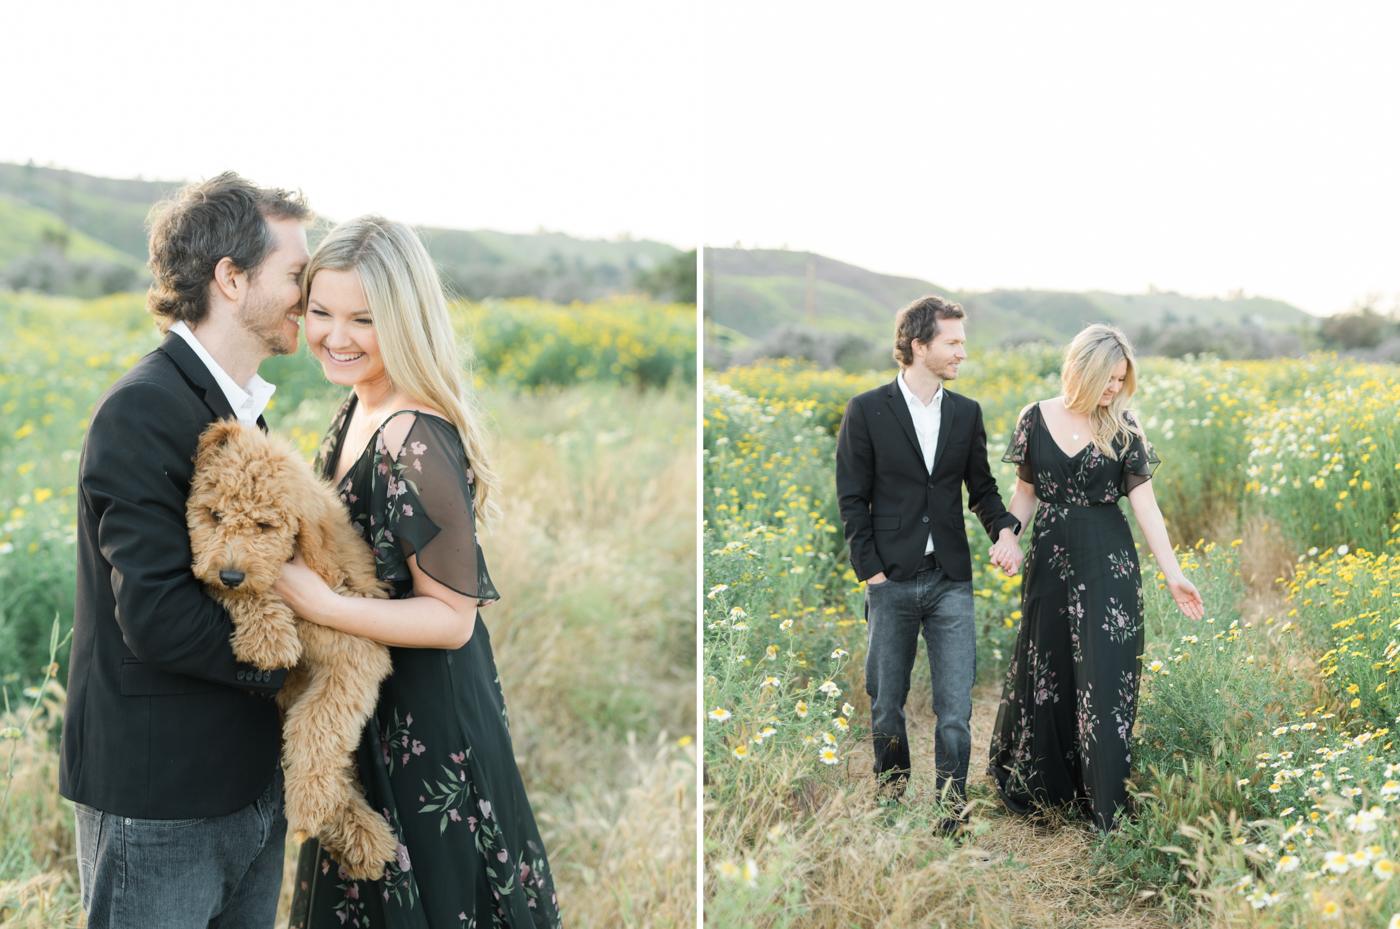 San_Juan_Capistrano_Goldendoodle_family_portrait_session_los_angeles_wedding_photographer-17.jpg